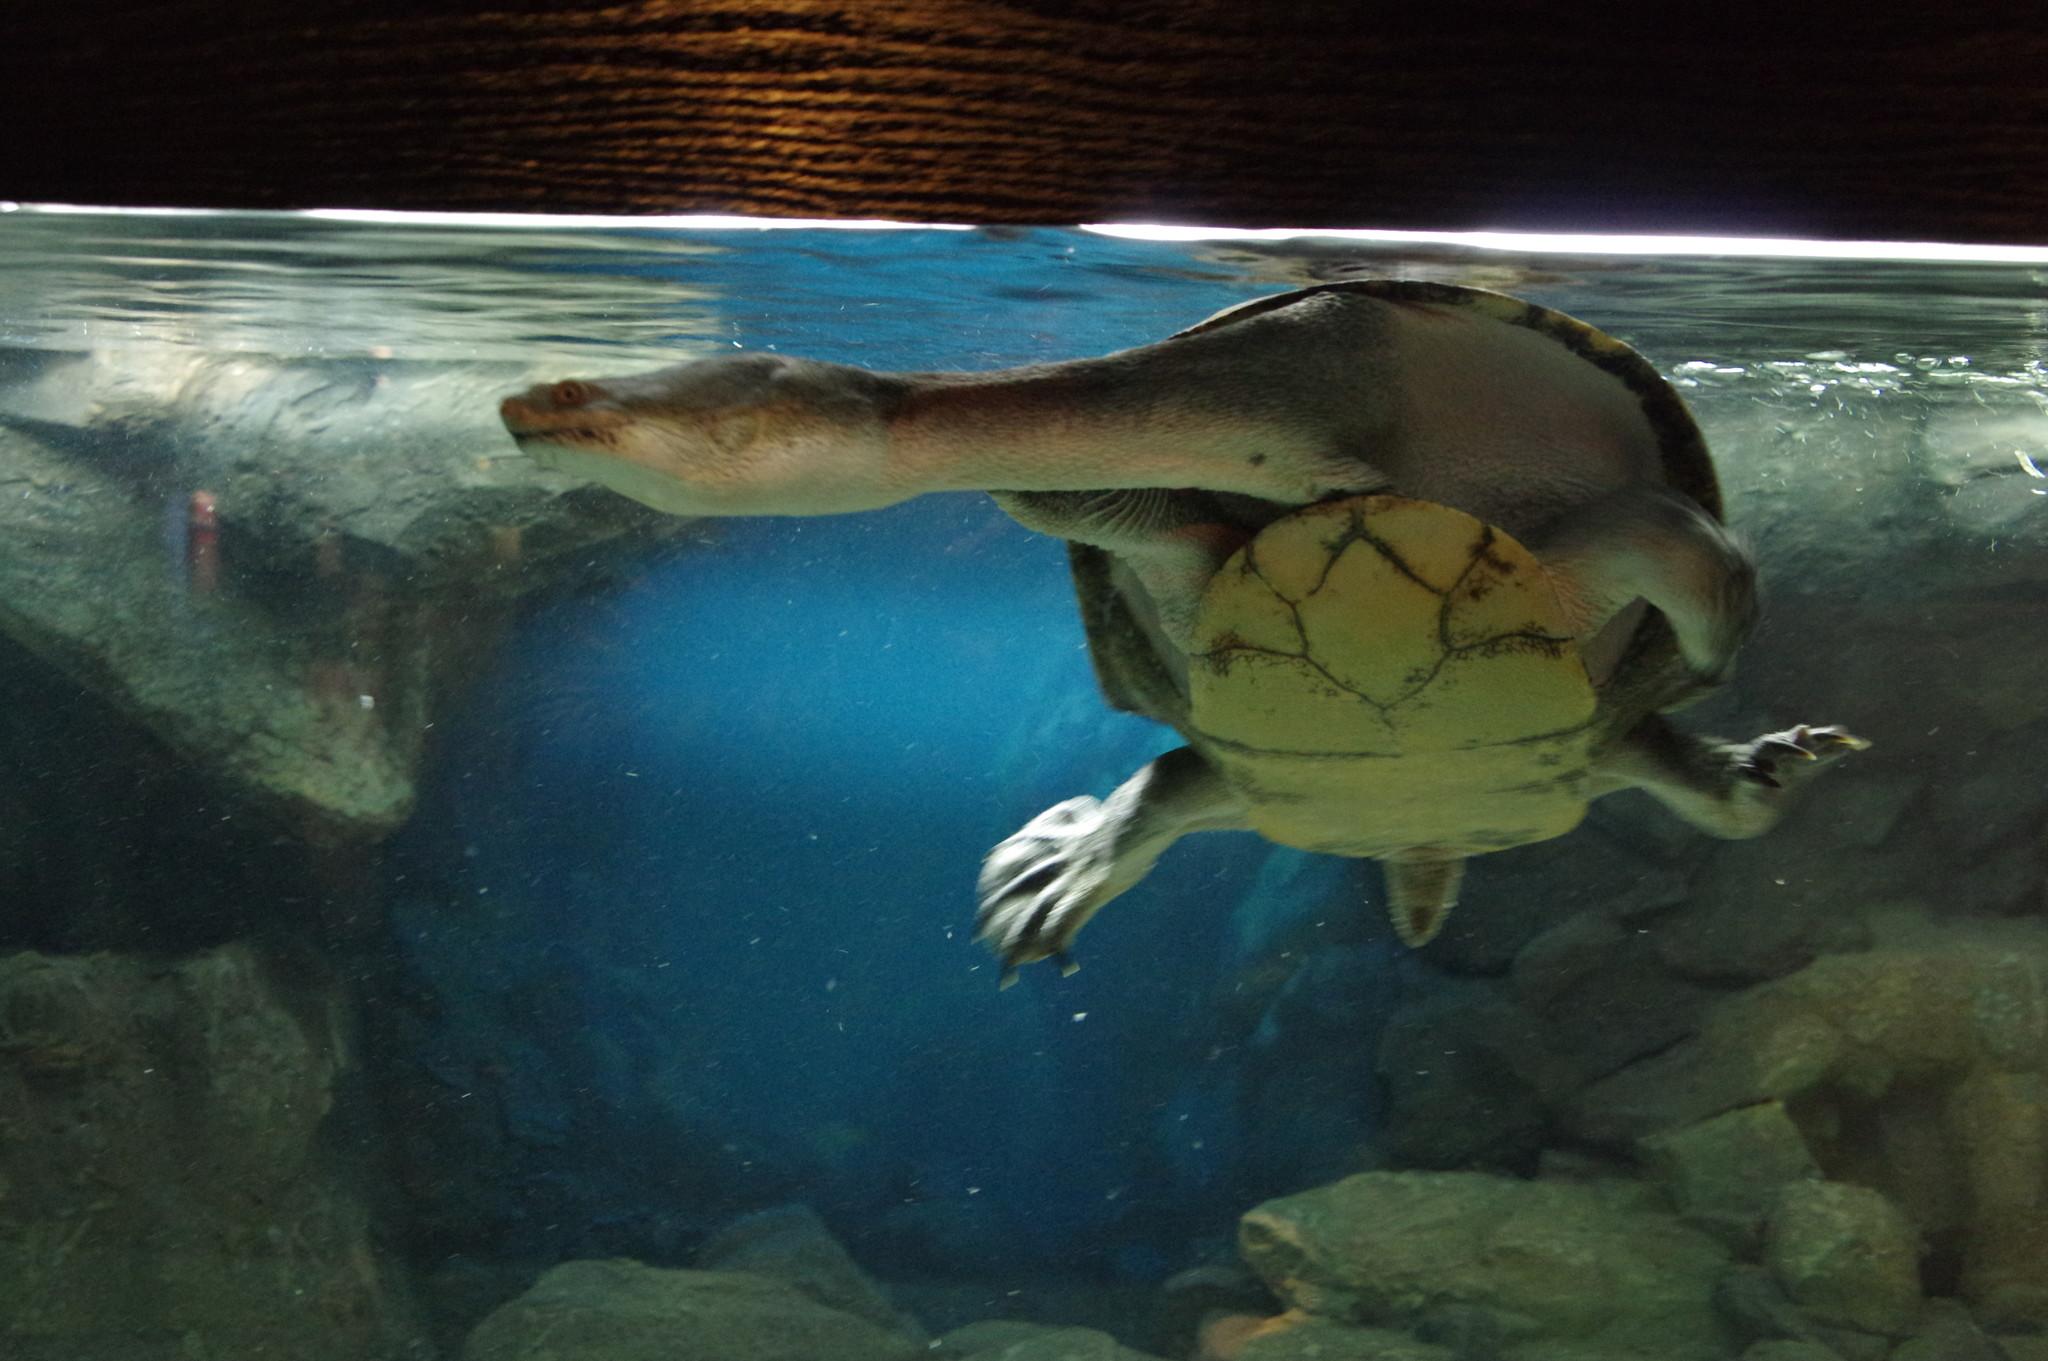 Амазонская змеиношейная черепаха. Музей истории аквариумистики (улица Арбат, дом 17)